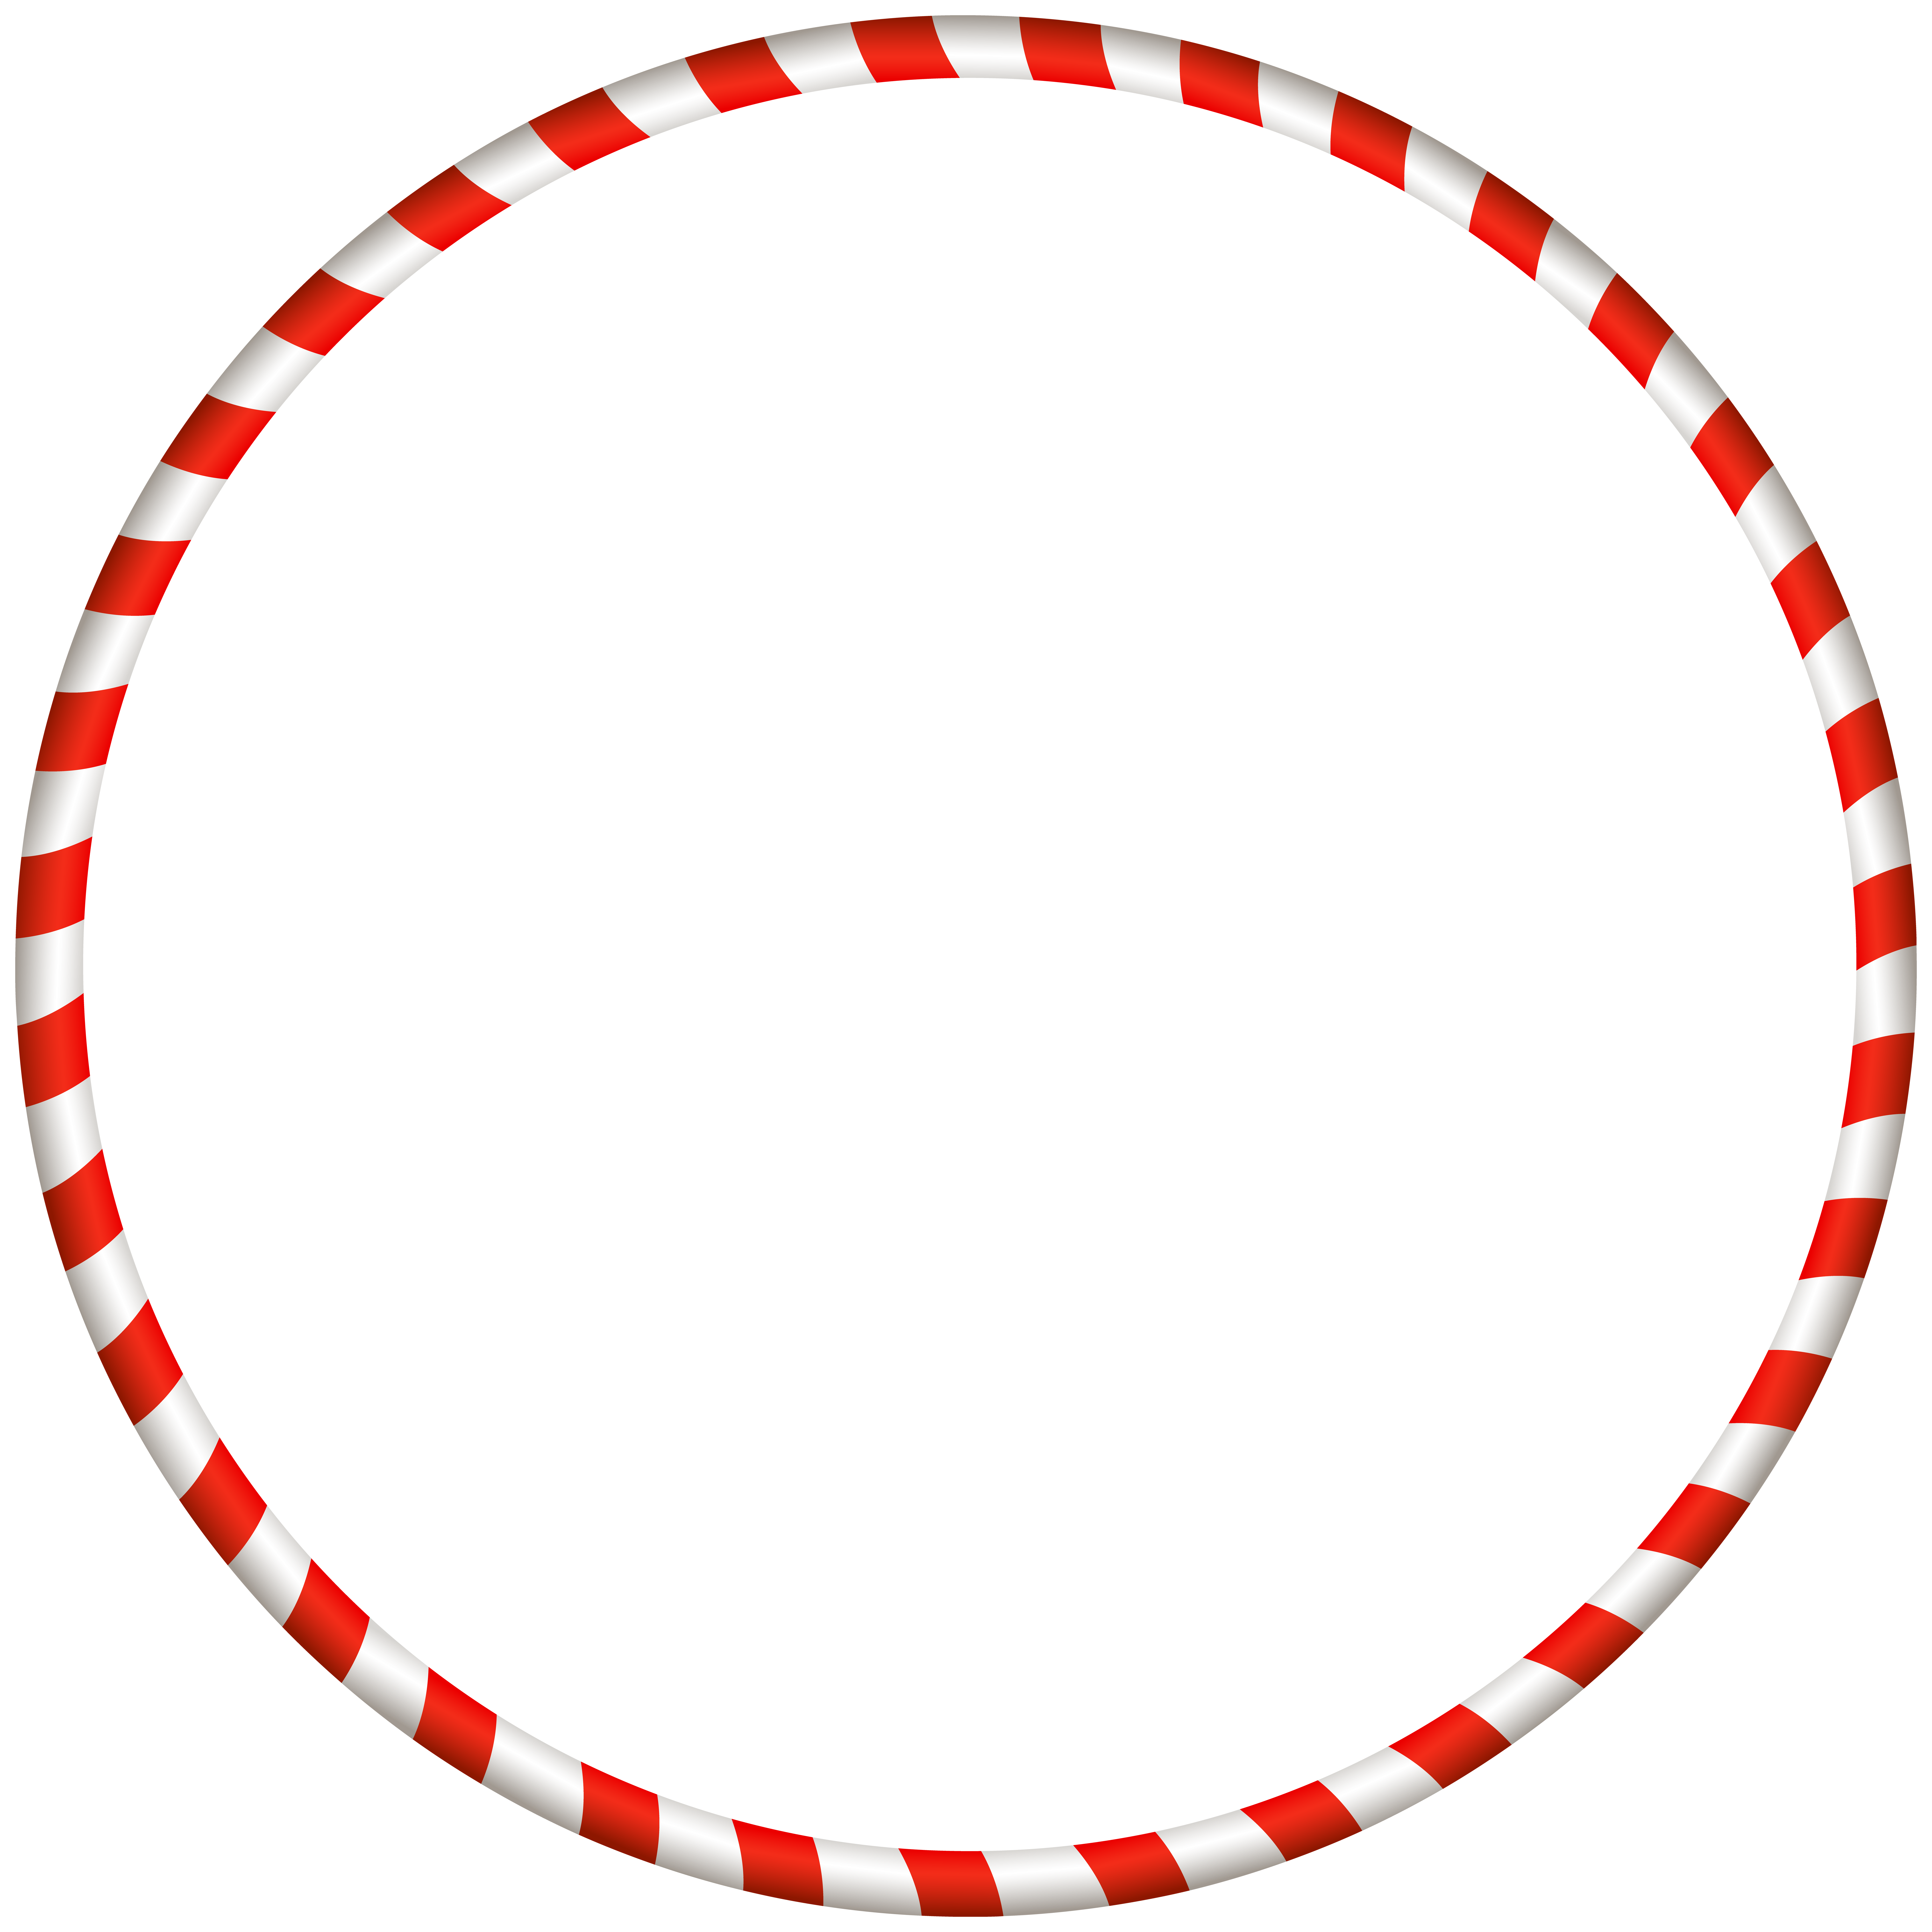 Christmas Candy Cane Border Clip Art Image.